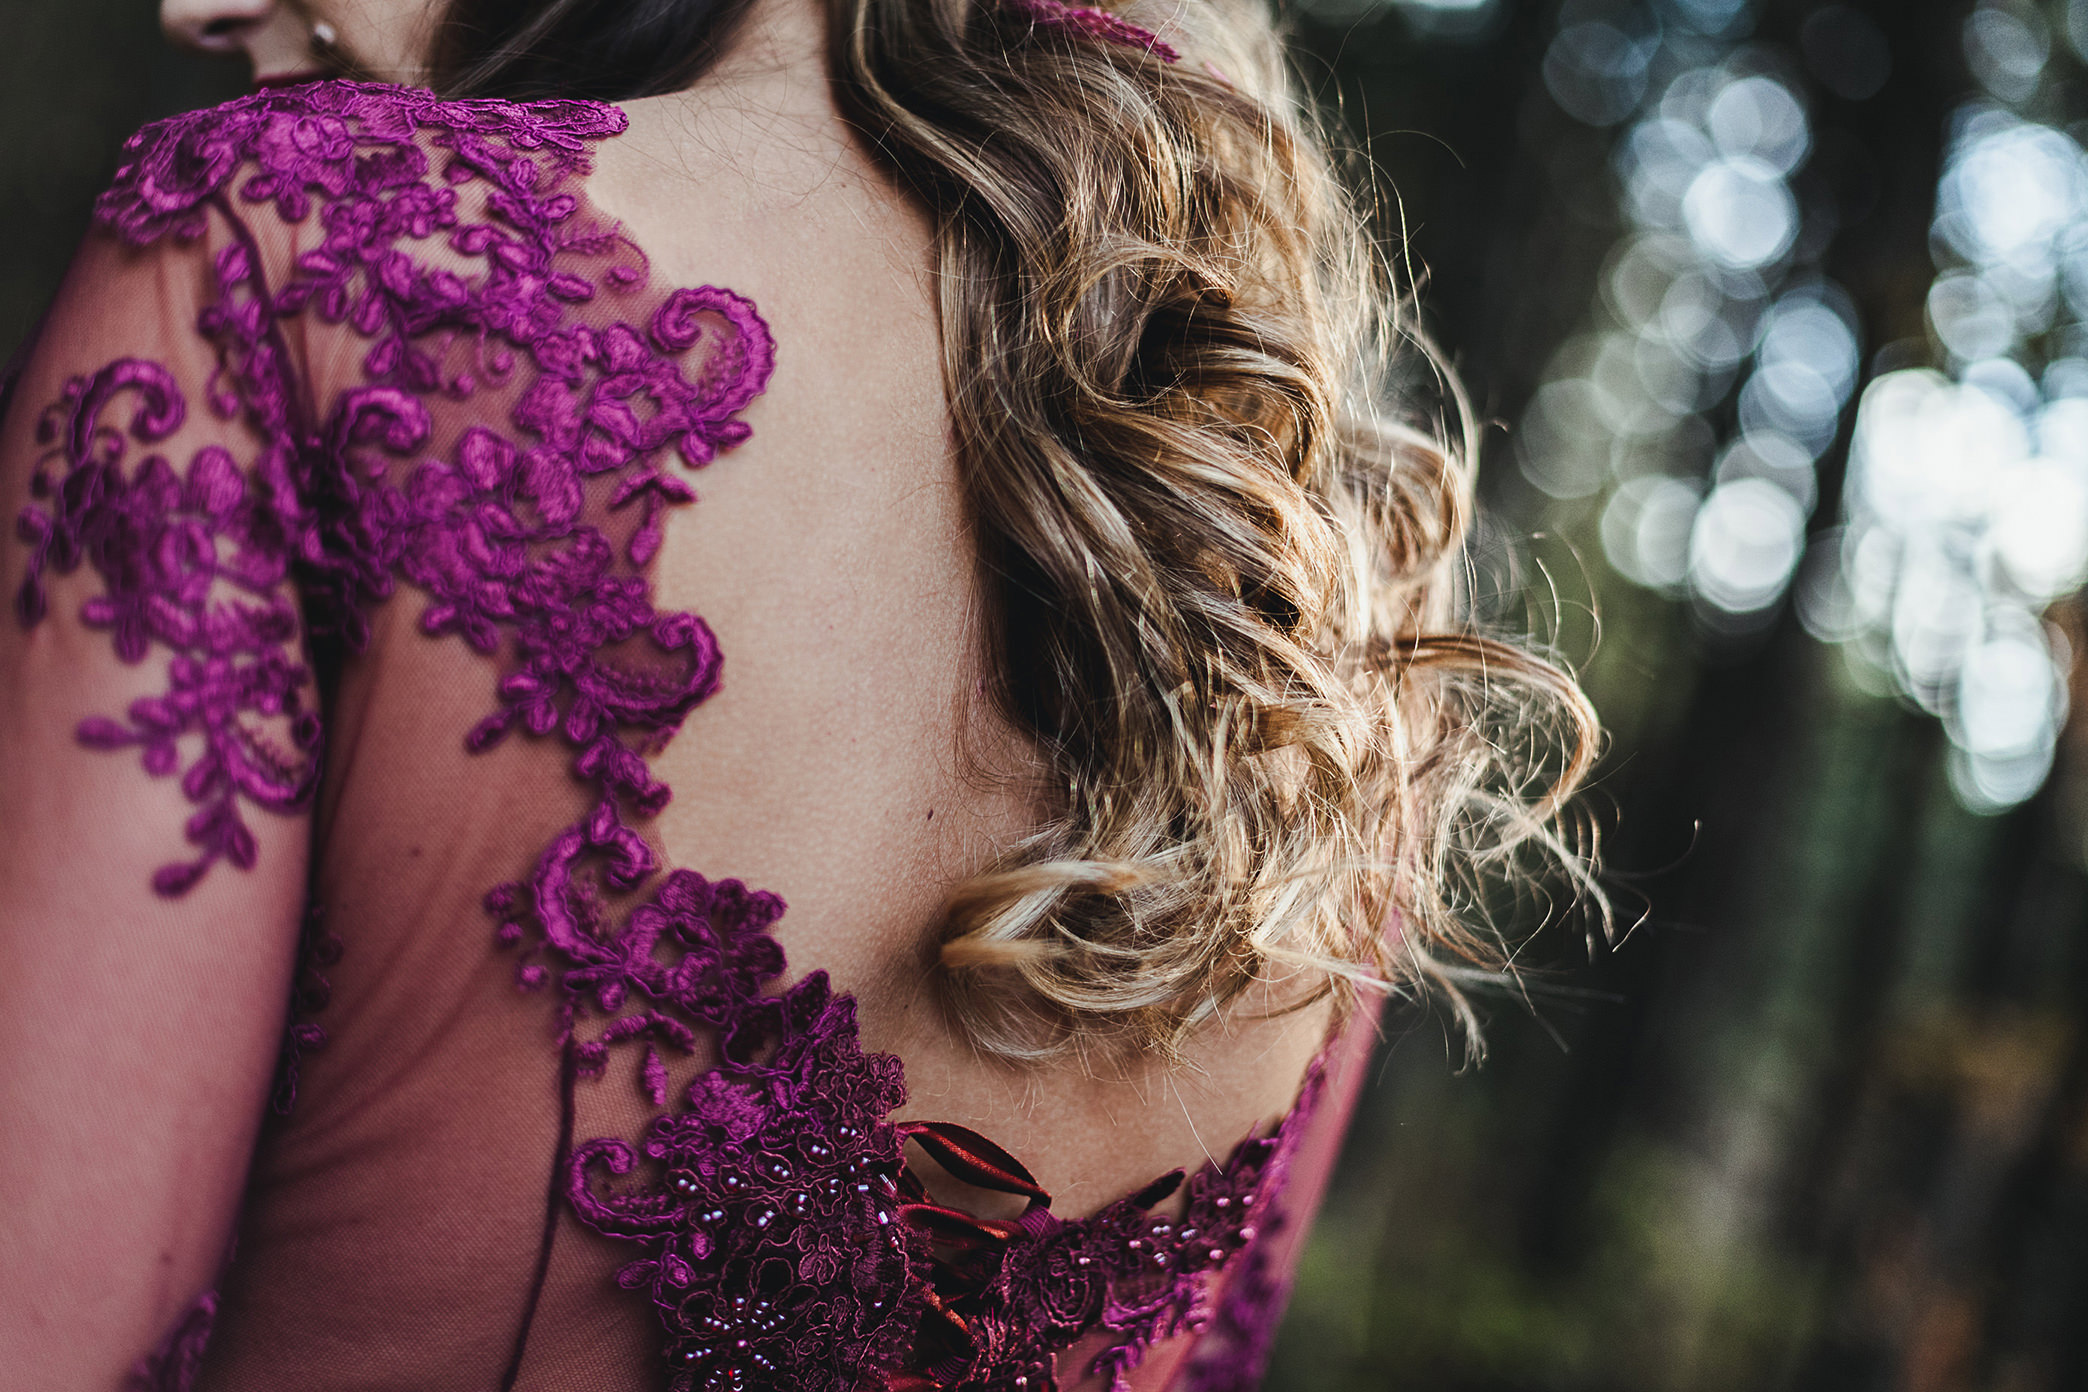 lace wedding dress inspiration